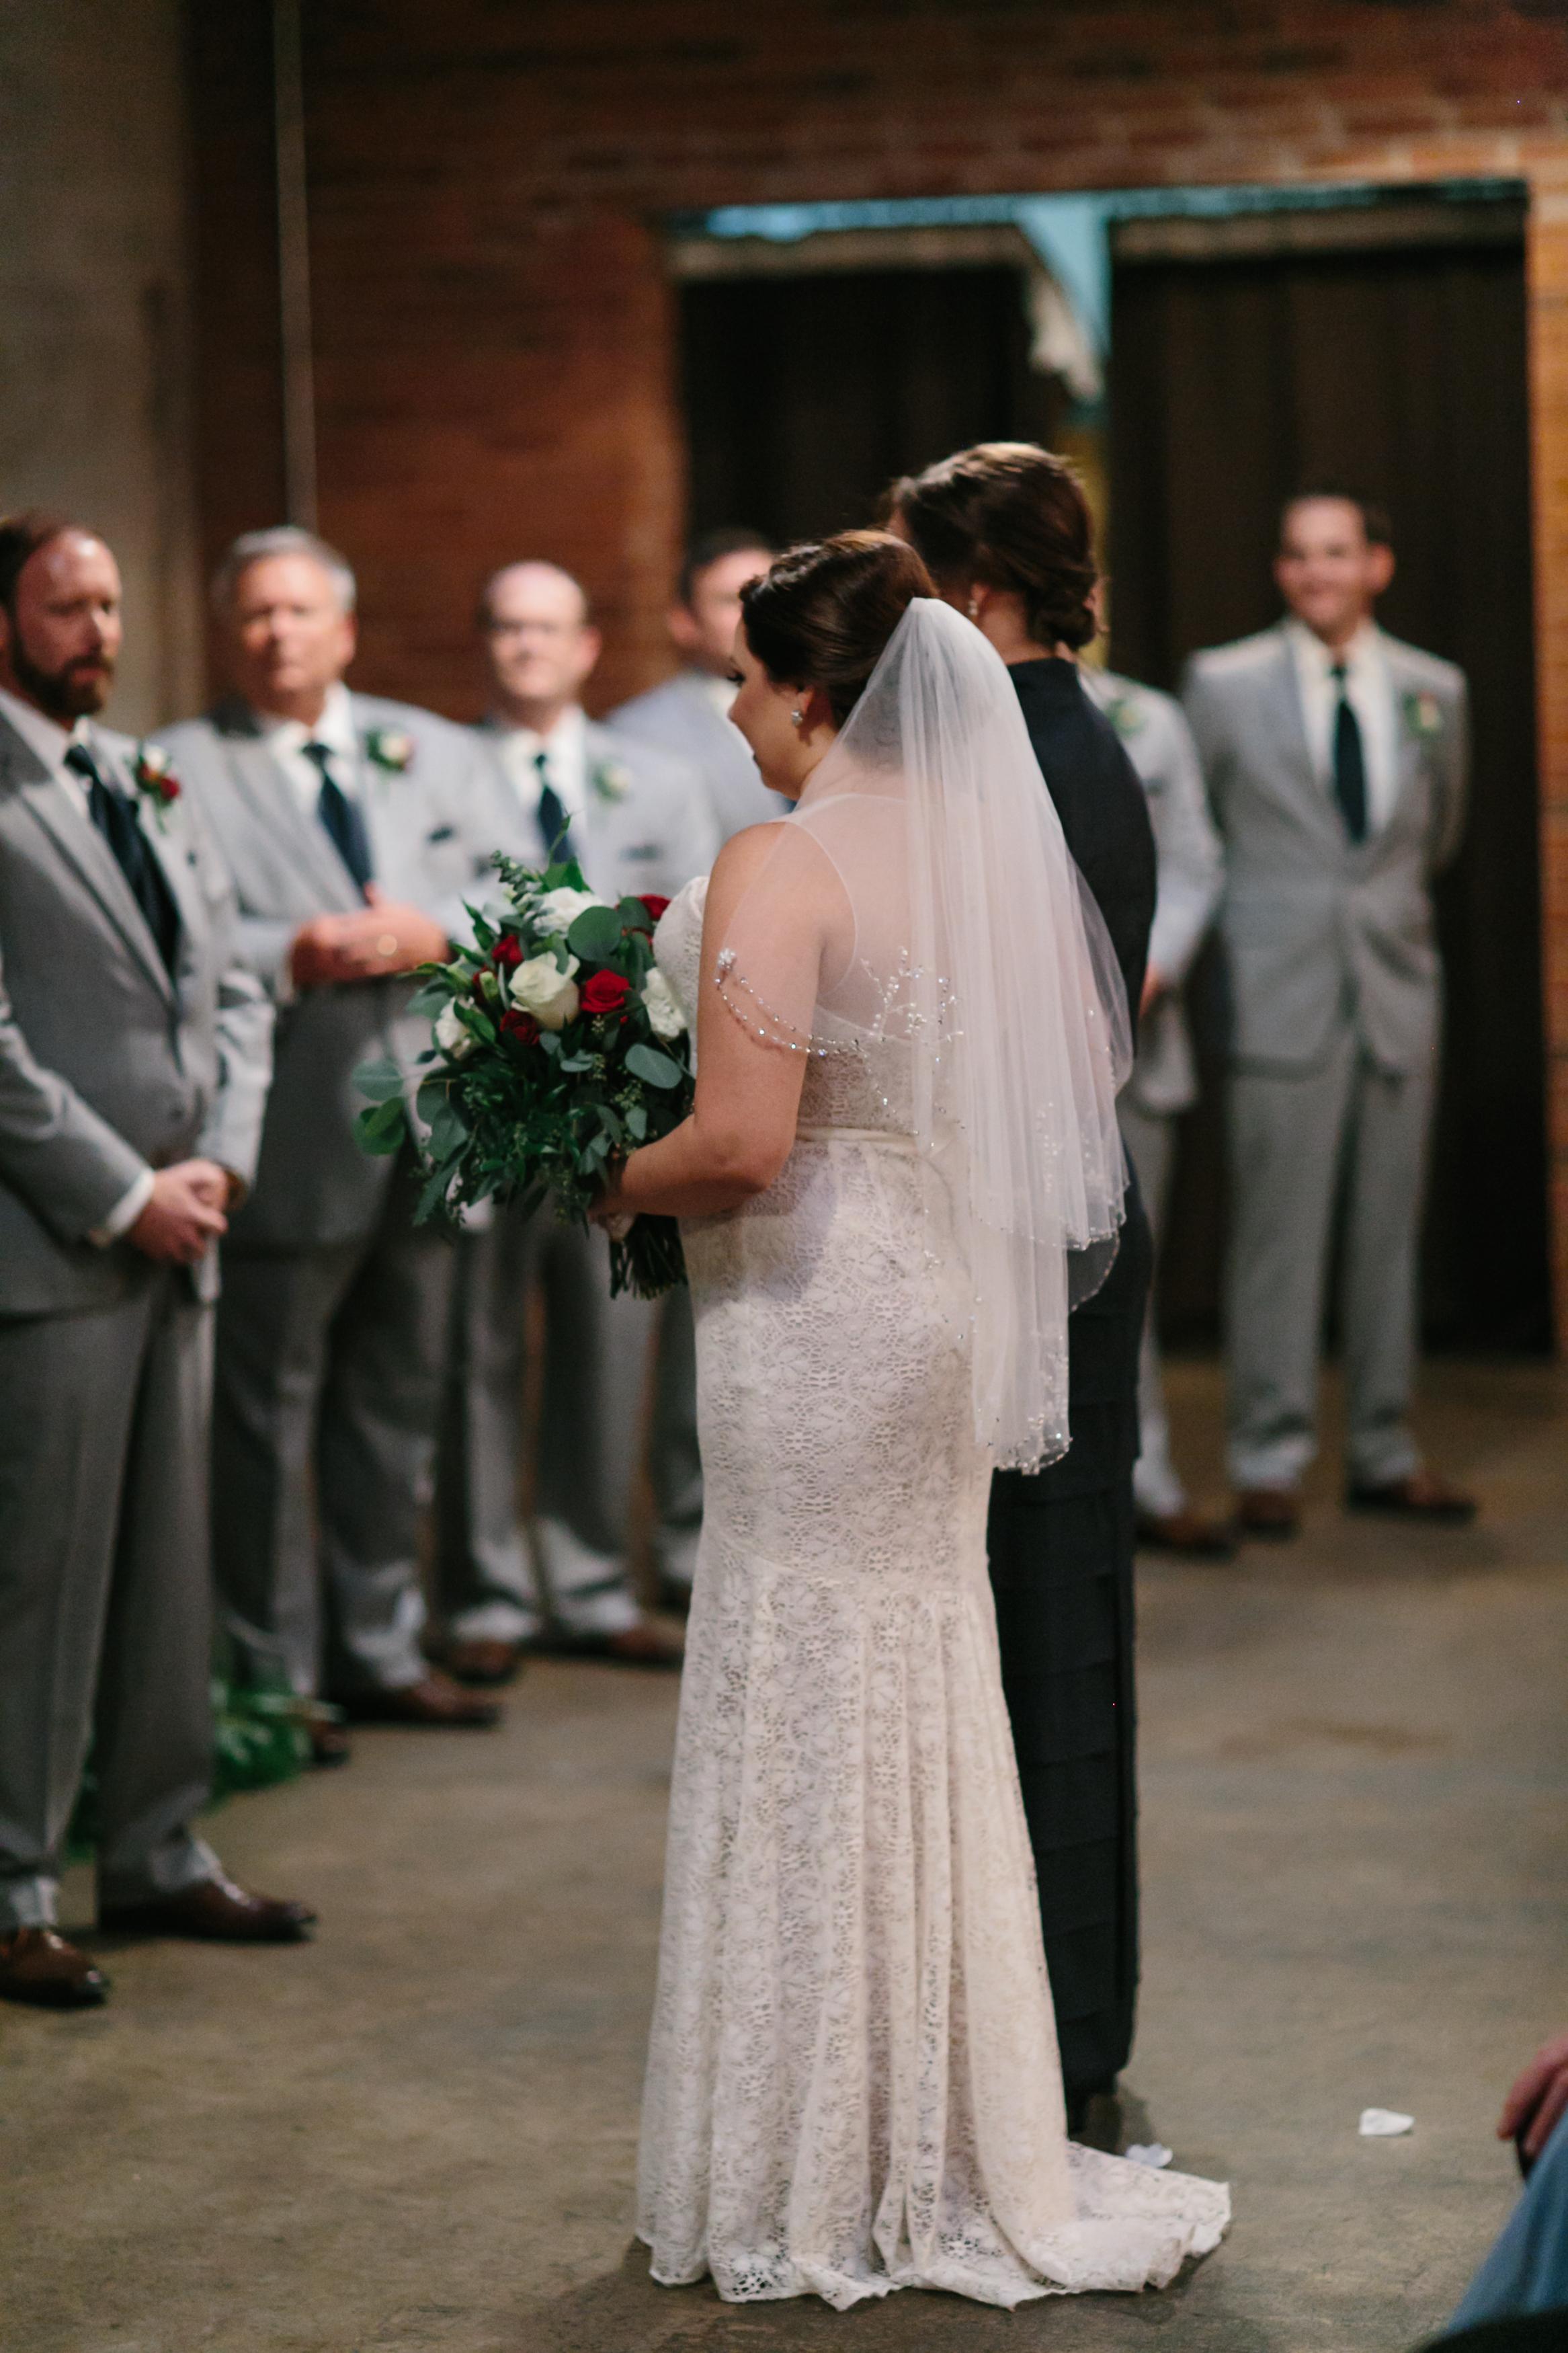 Jessica_Bryan_Wedding_Standard_Knoxville_Abigail_Malone_Photography-540.jpg